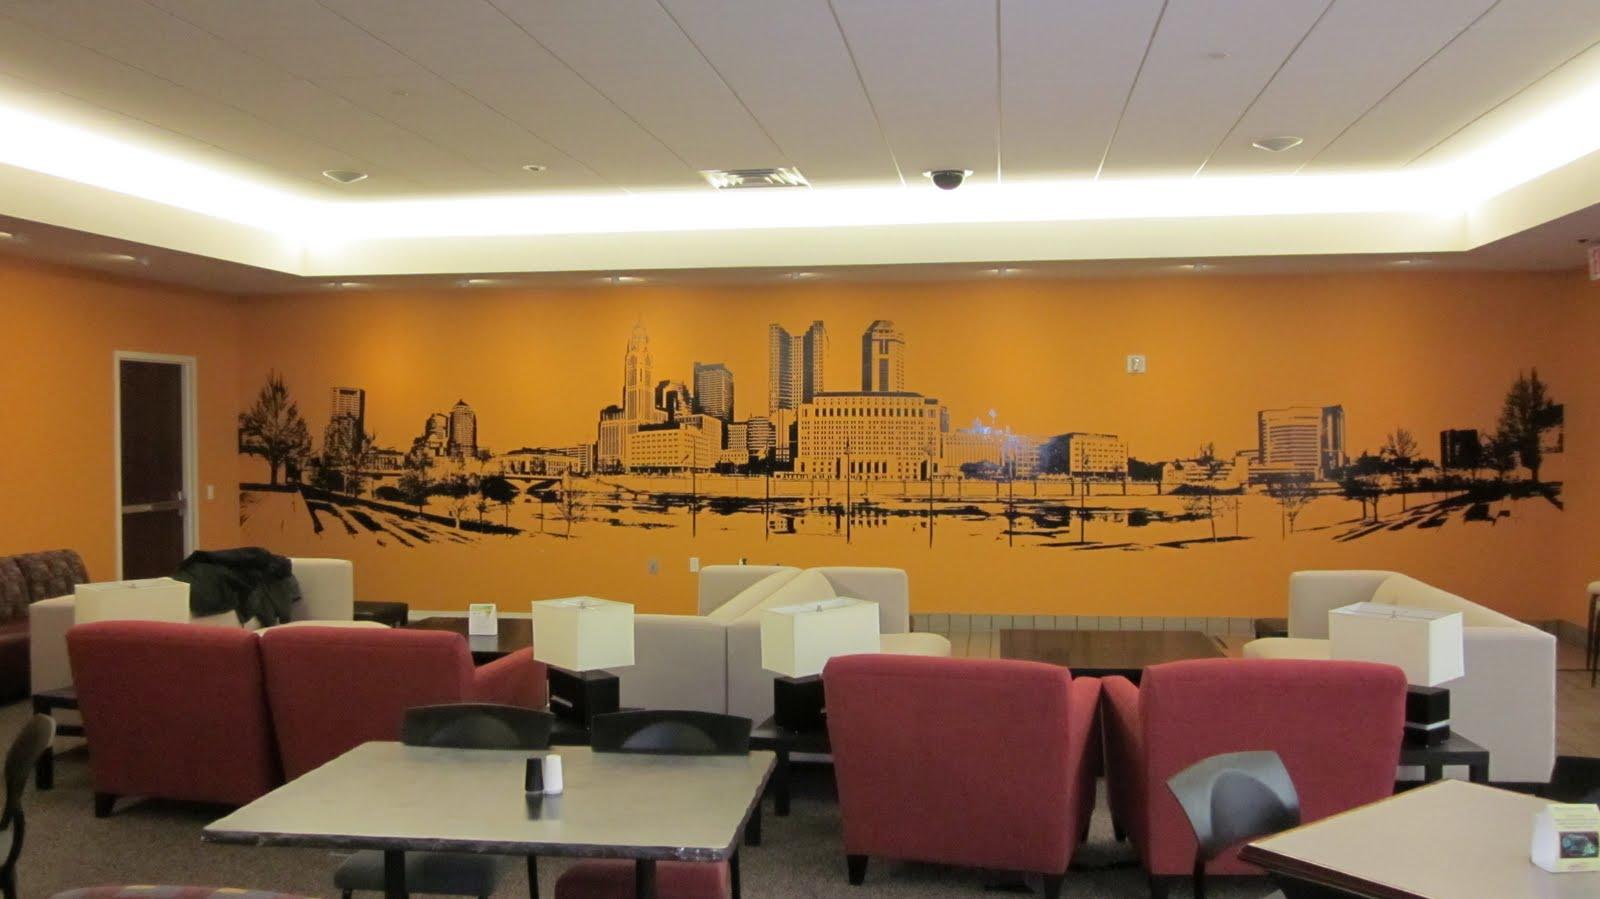 Wall Murals and Graphics Buckeye Sign Blog The blog